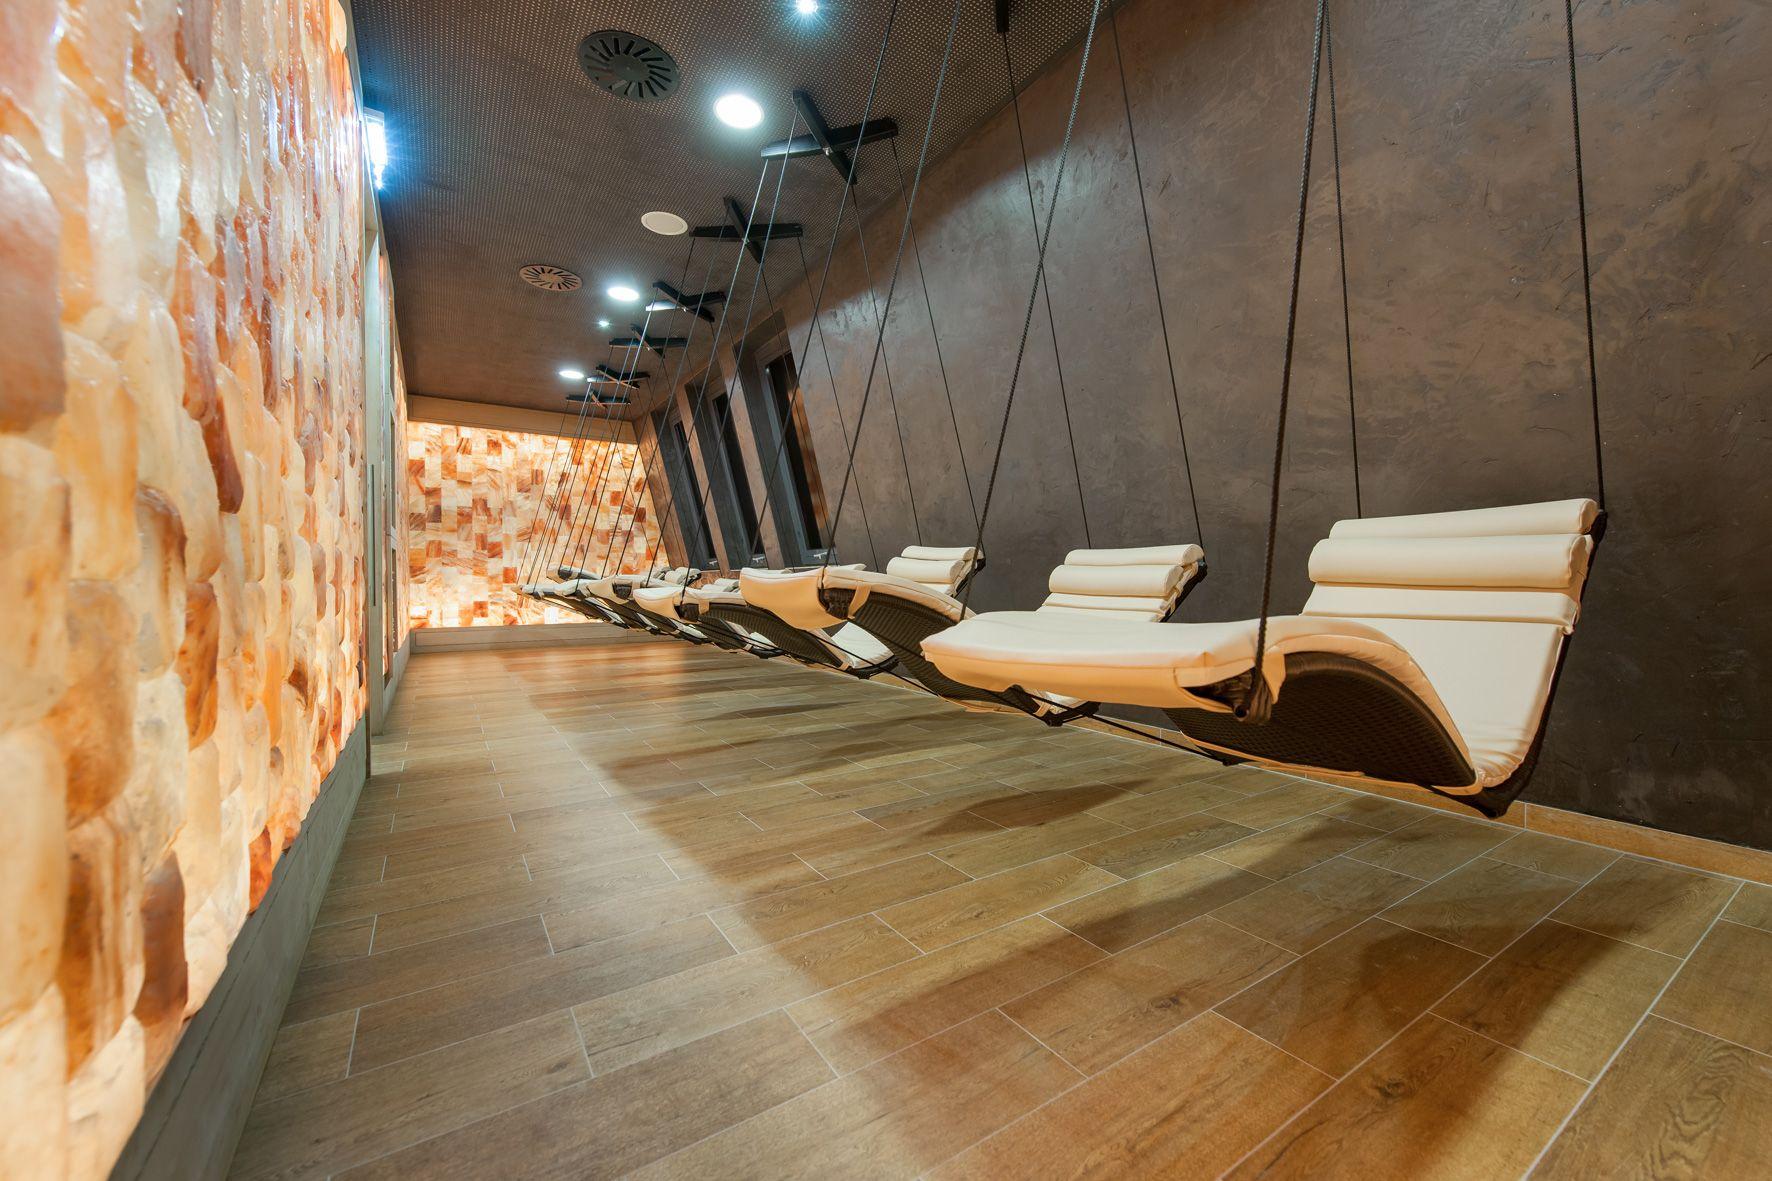 schweberuhe un spa chez soi pinterest aqua. Black Bedroom Furniture Sets. Home Design Ideas